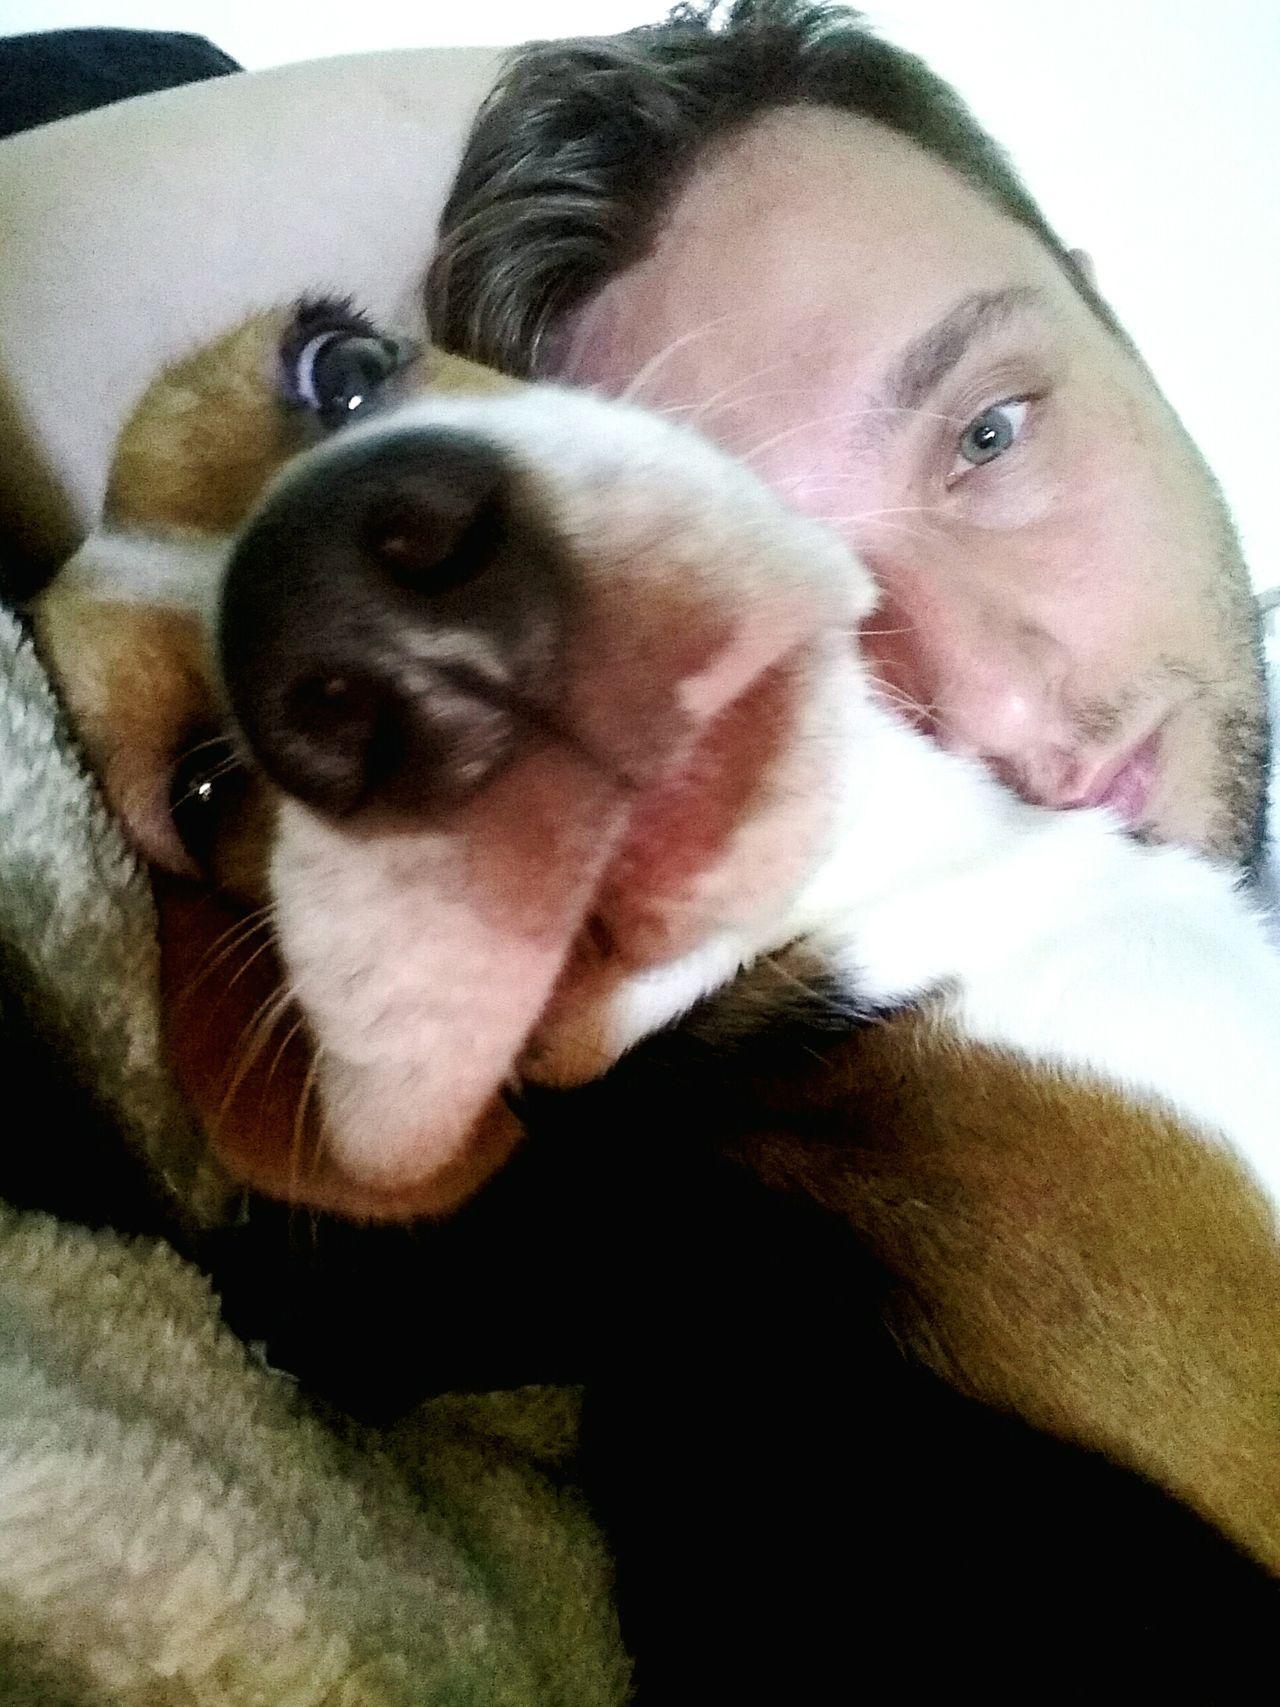 Ori lazy Looking At Camera Portrait Front View Indoors  Dog❤ Beagle Beaglelove Youandme Dog Life Puppy World Sky Origins Looking At Camera Beaglelife Beaglestagram One Animal Worldwide Beaglemania Nature